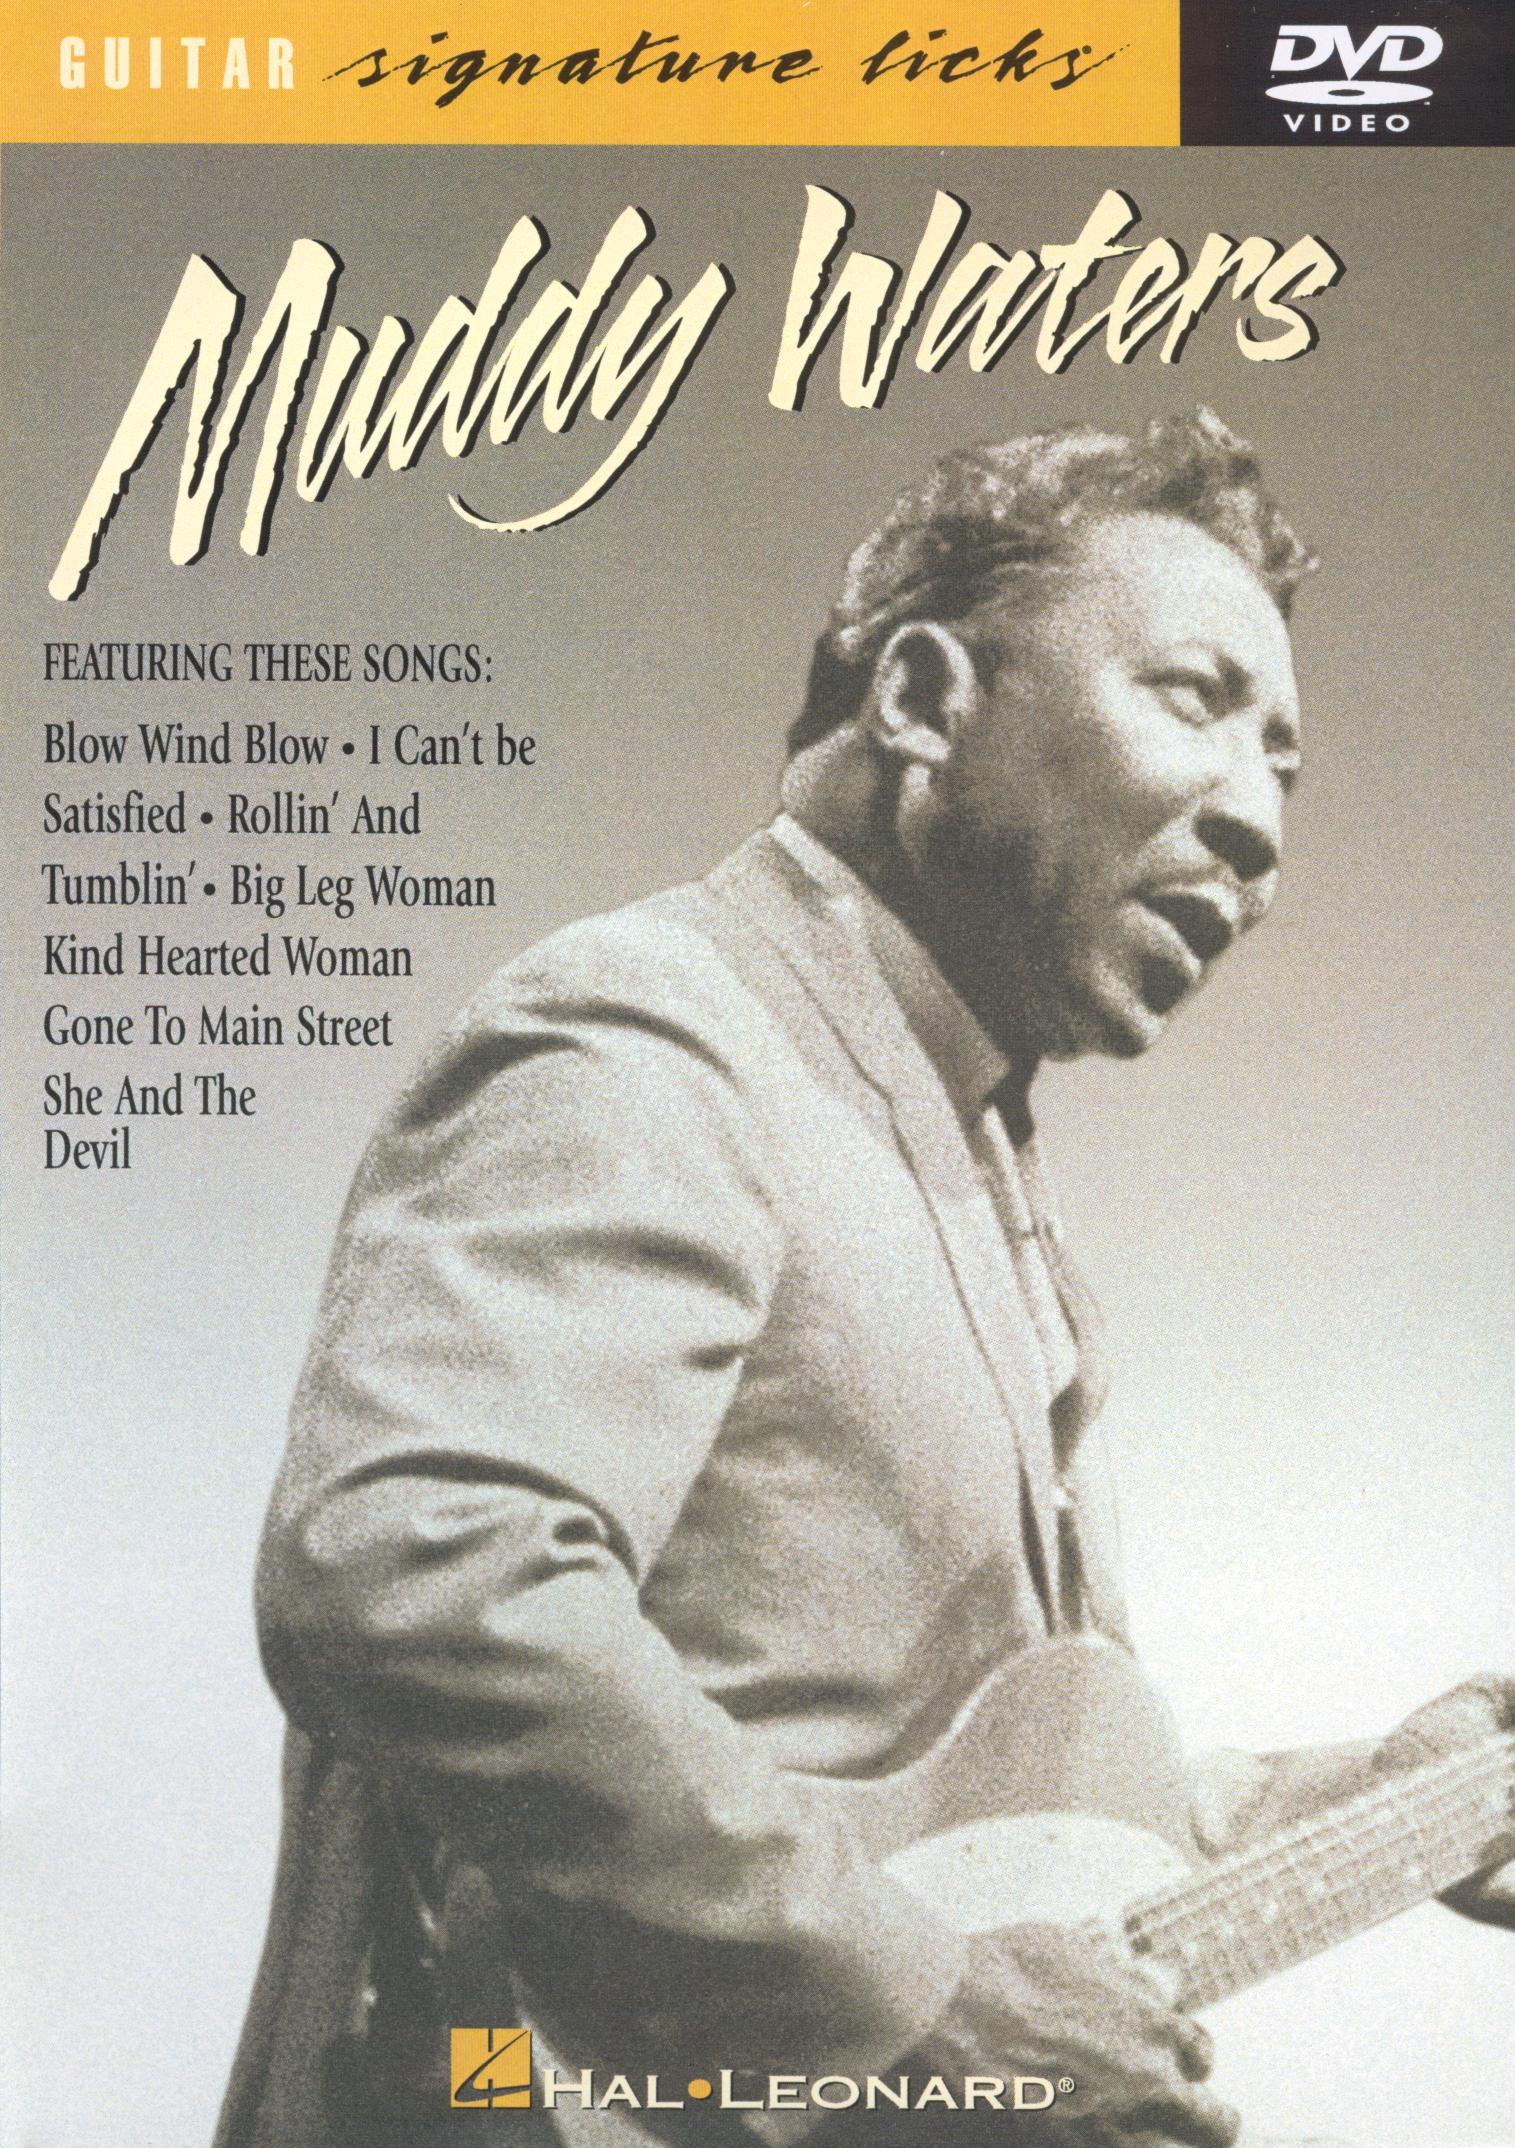 Guitar Signature Licks: Muddy Waters